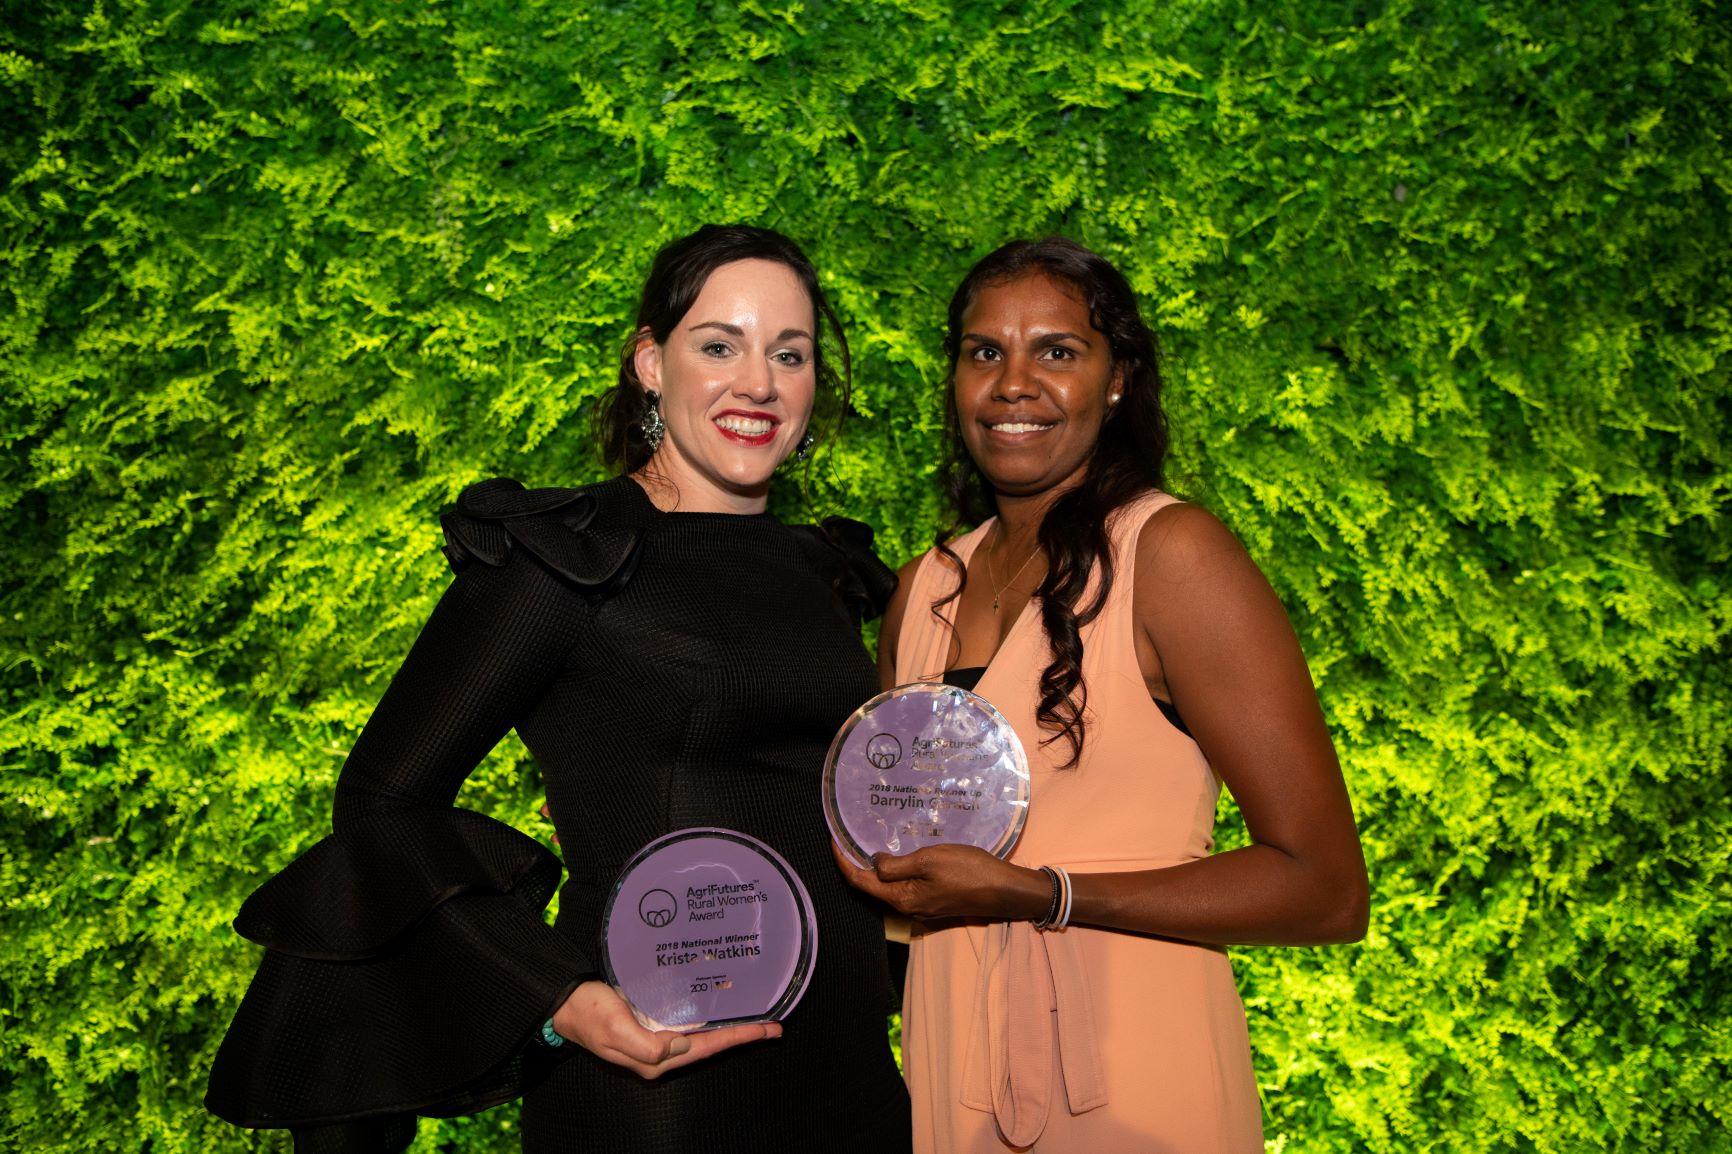 2018 National Winner Krista Watkins and Ruinner-up Darrylin Gordon